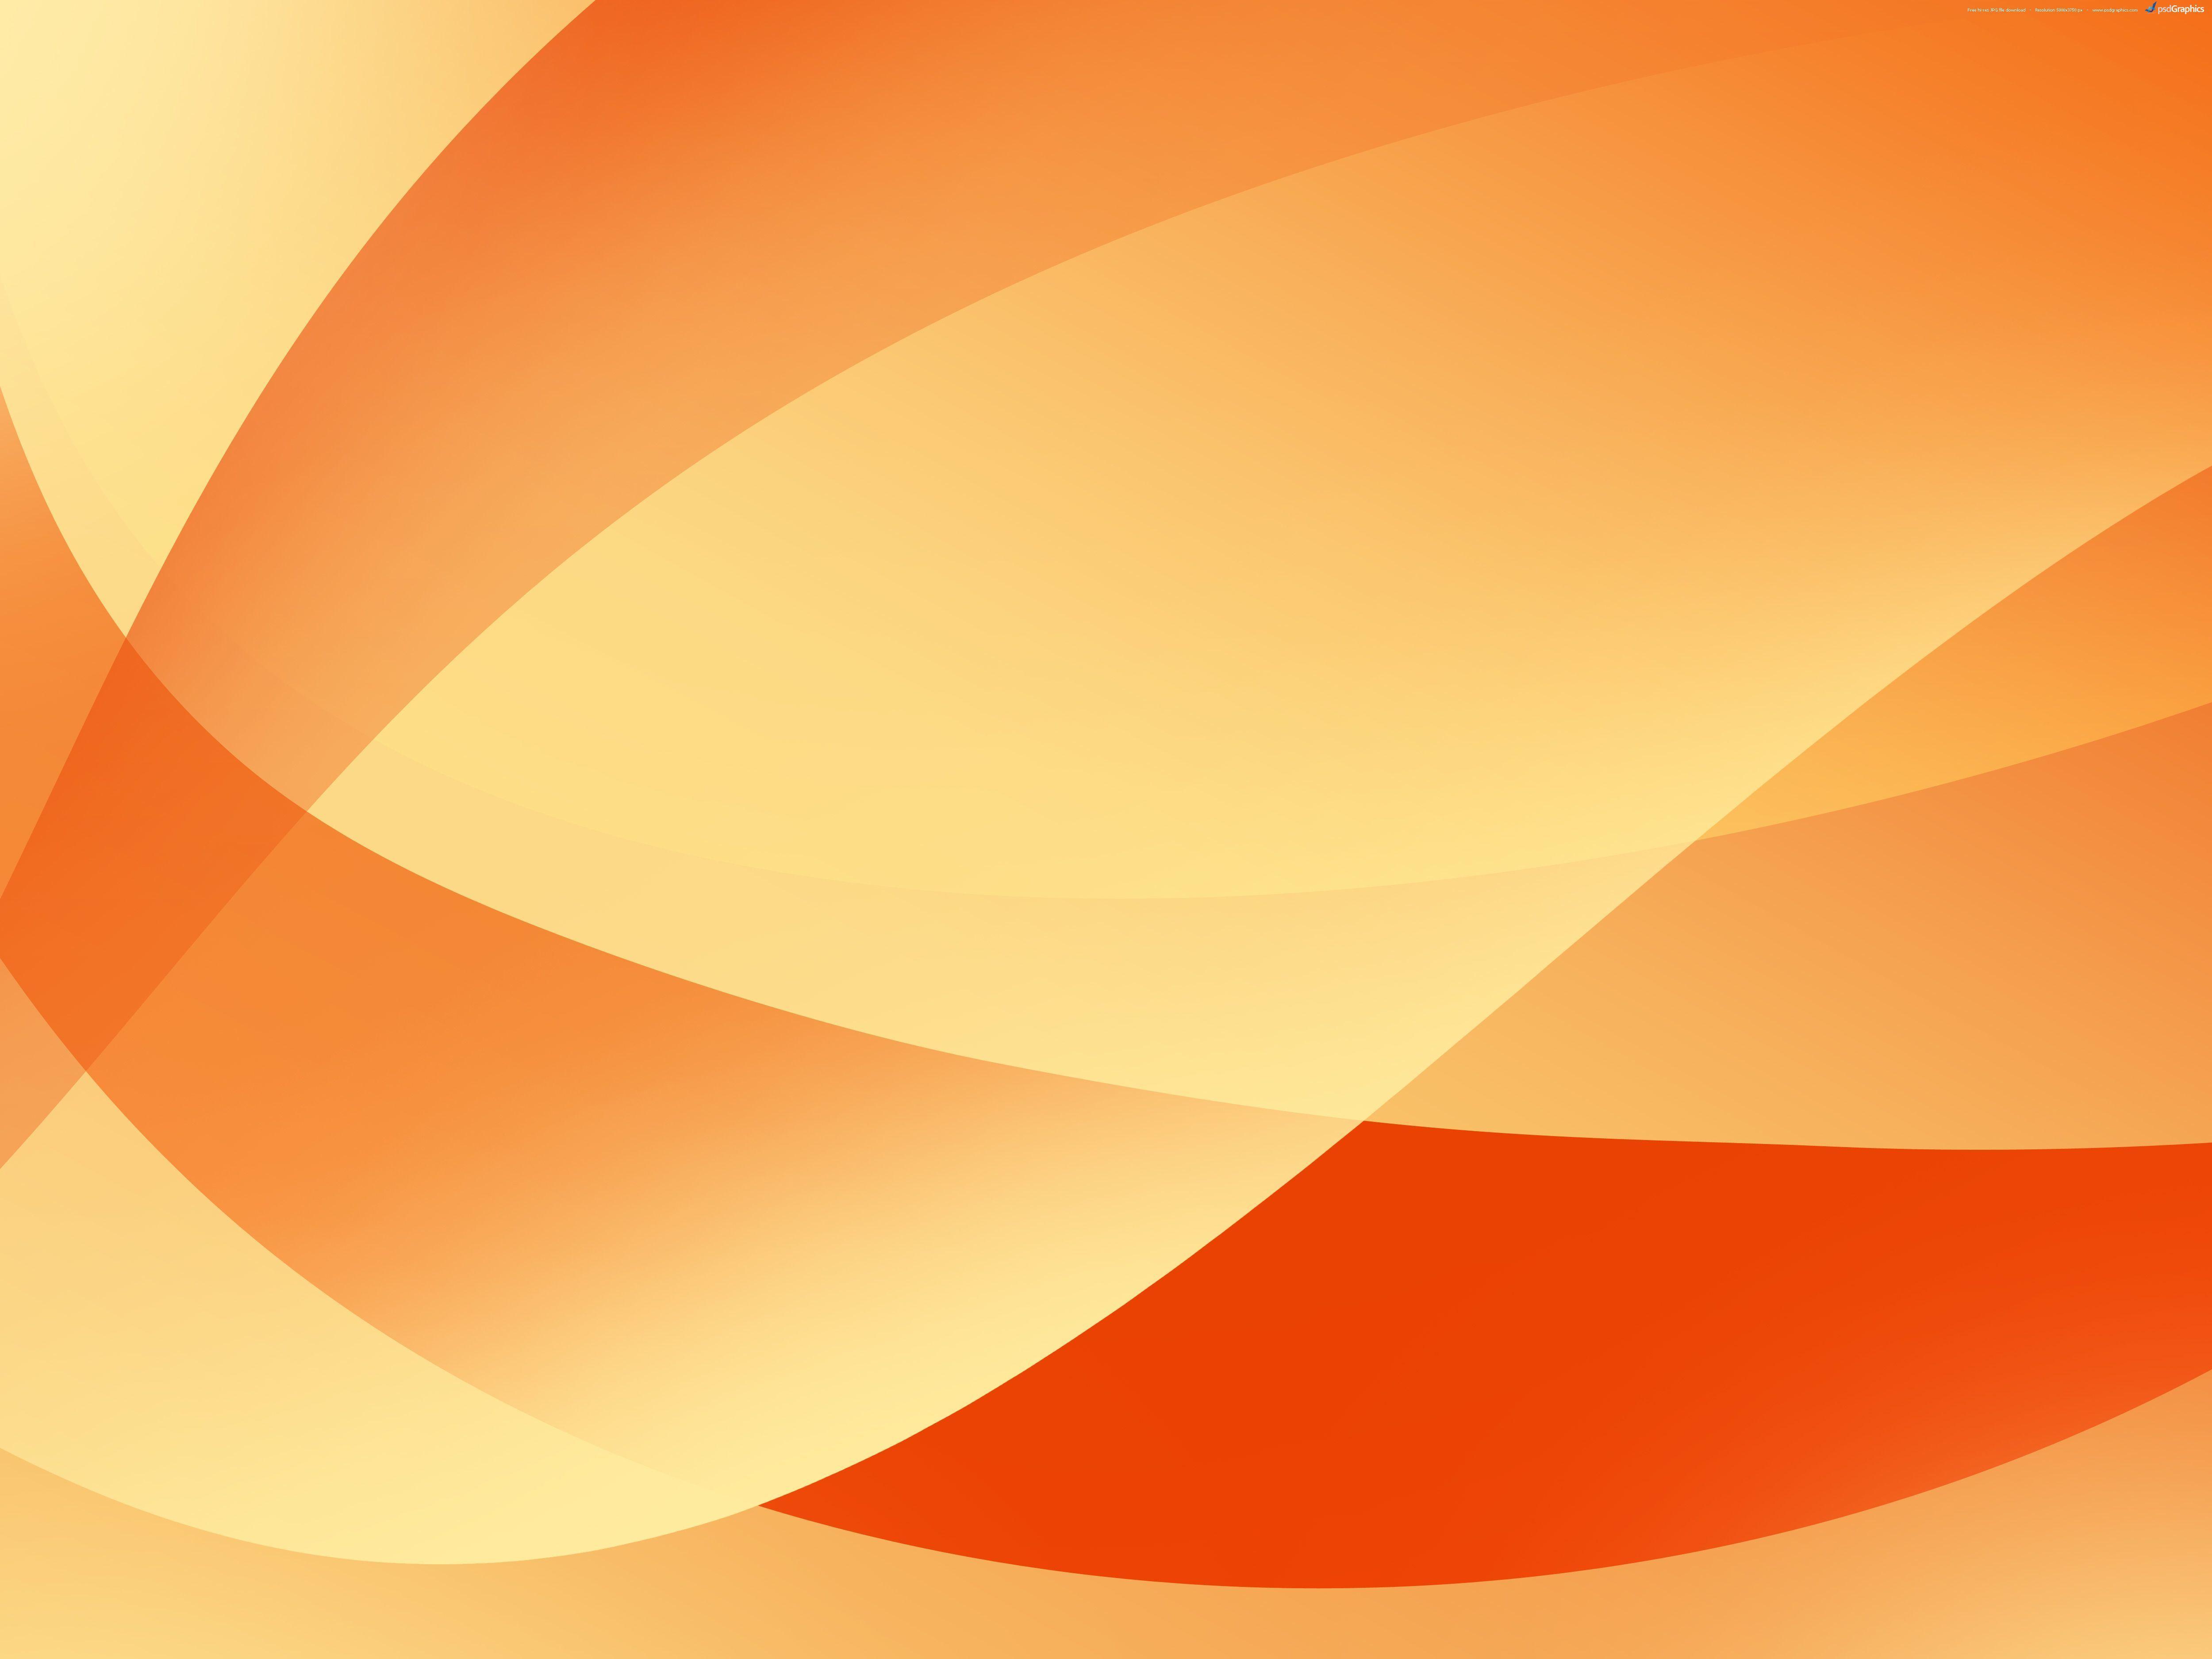 Abstract Orange Backgrounds Psdgraphics Orange Background